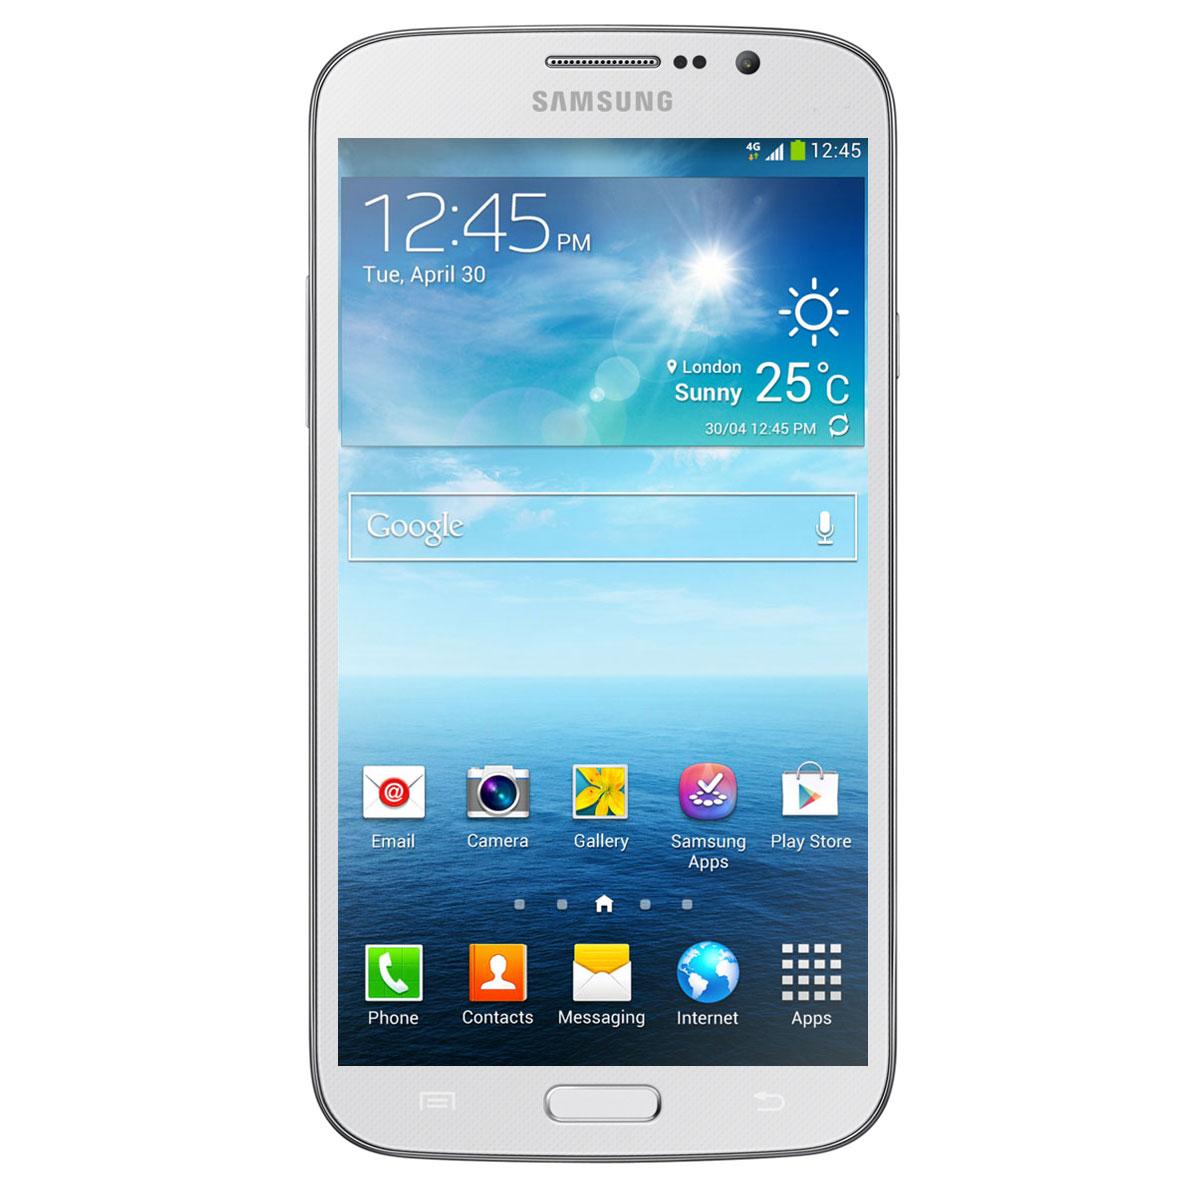 "Mobile & smartphone Samsung Galaxy Mega 6.3 GT-i9205 Blanc Smartphone 4G-LTE avec écran tactile HD 6.3"" sous Android 4.2"